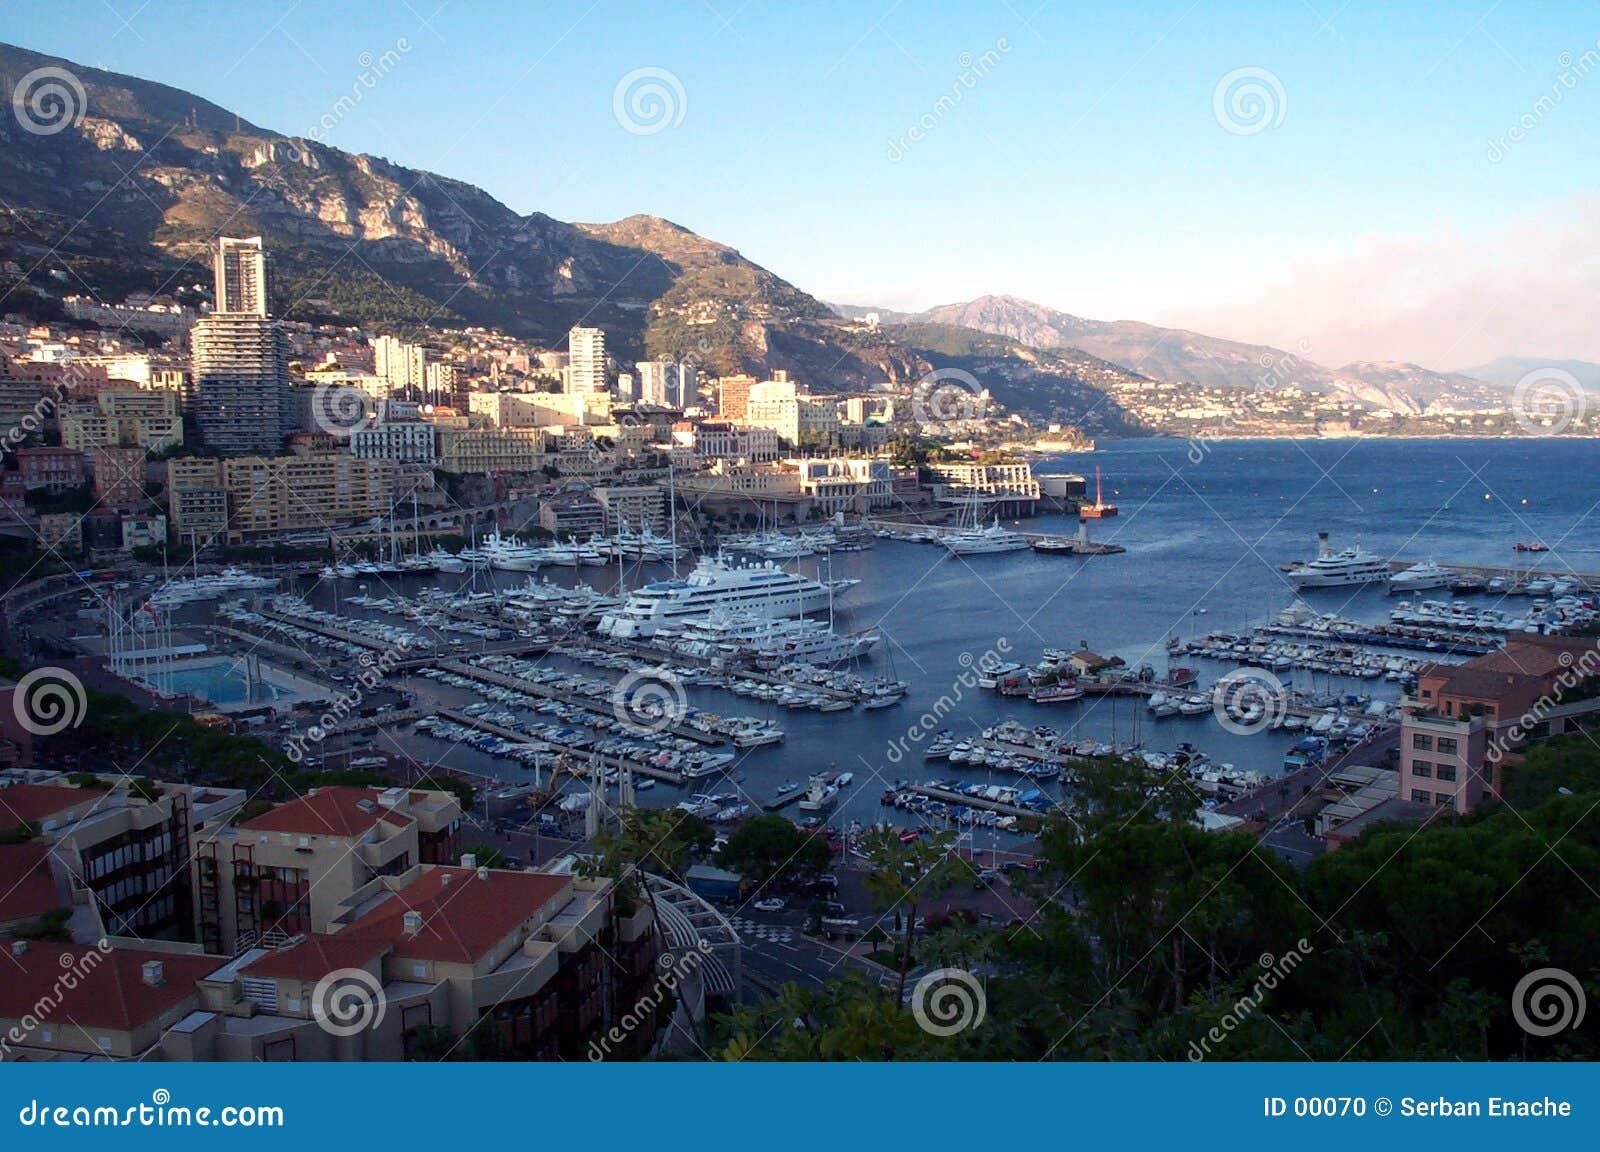 Monaco docks from above